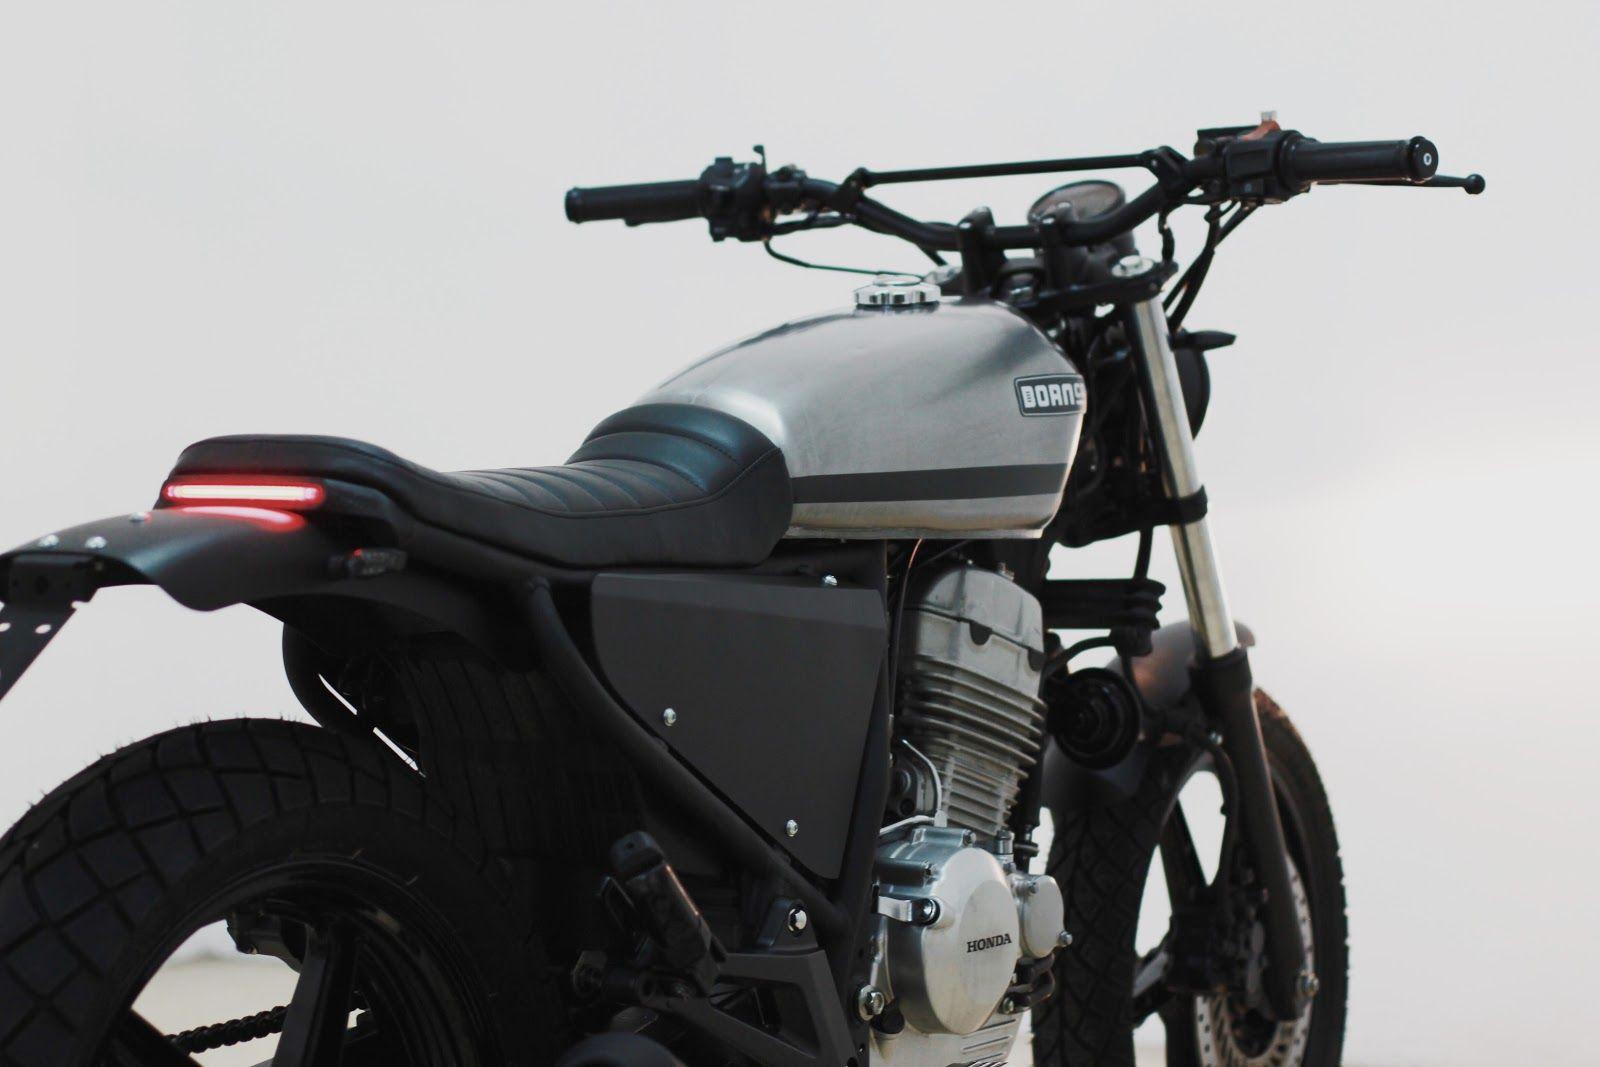 Production manufactory motorbikes